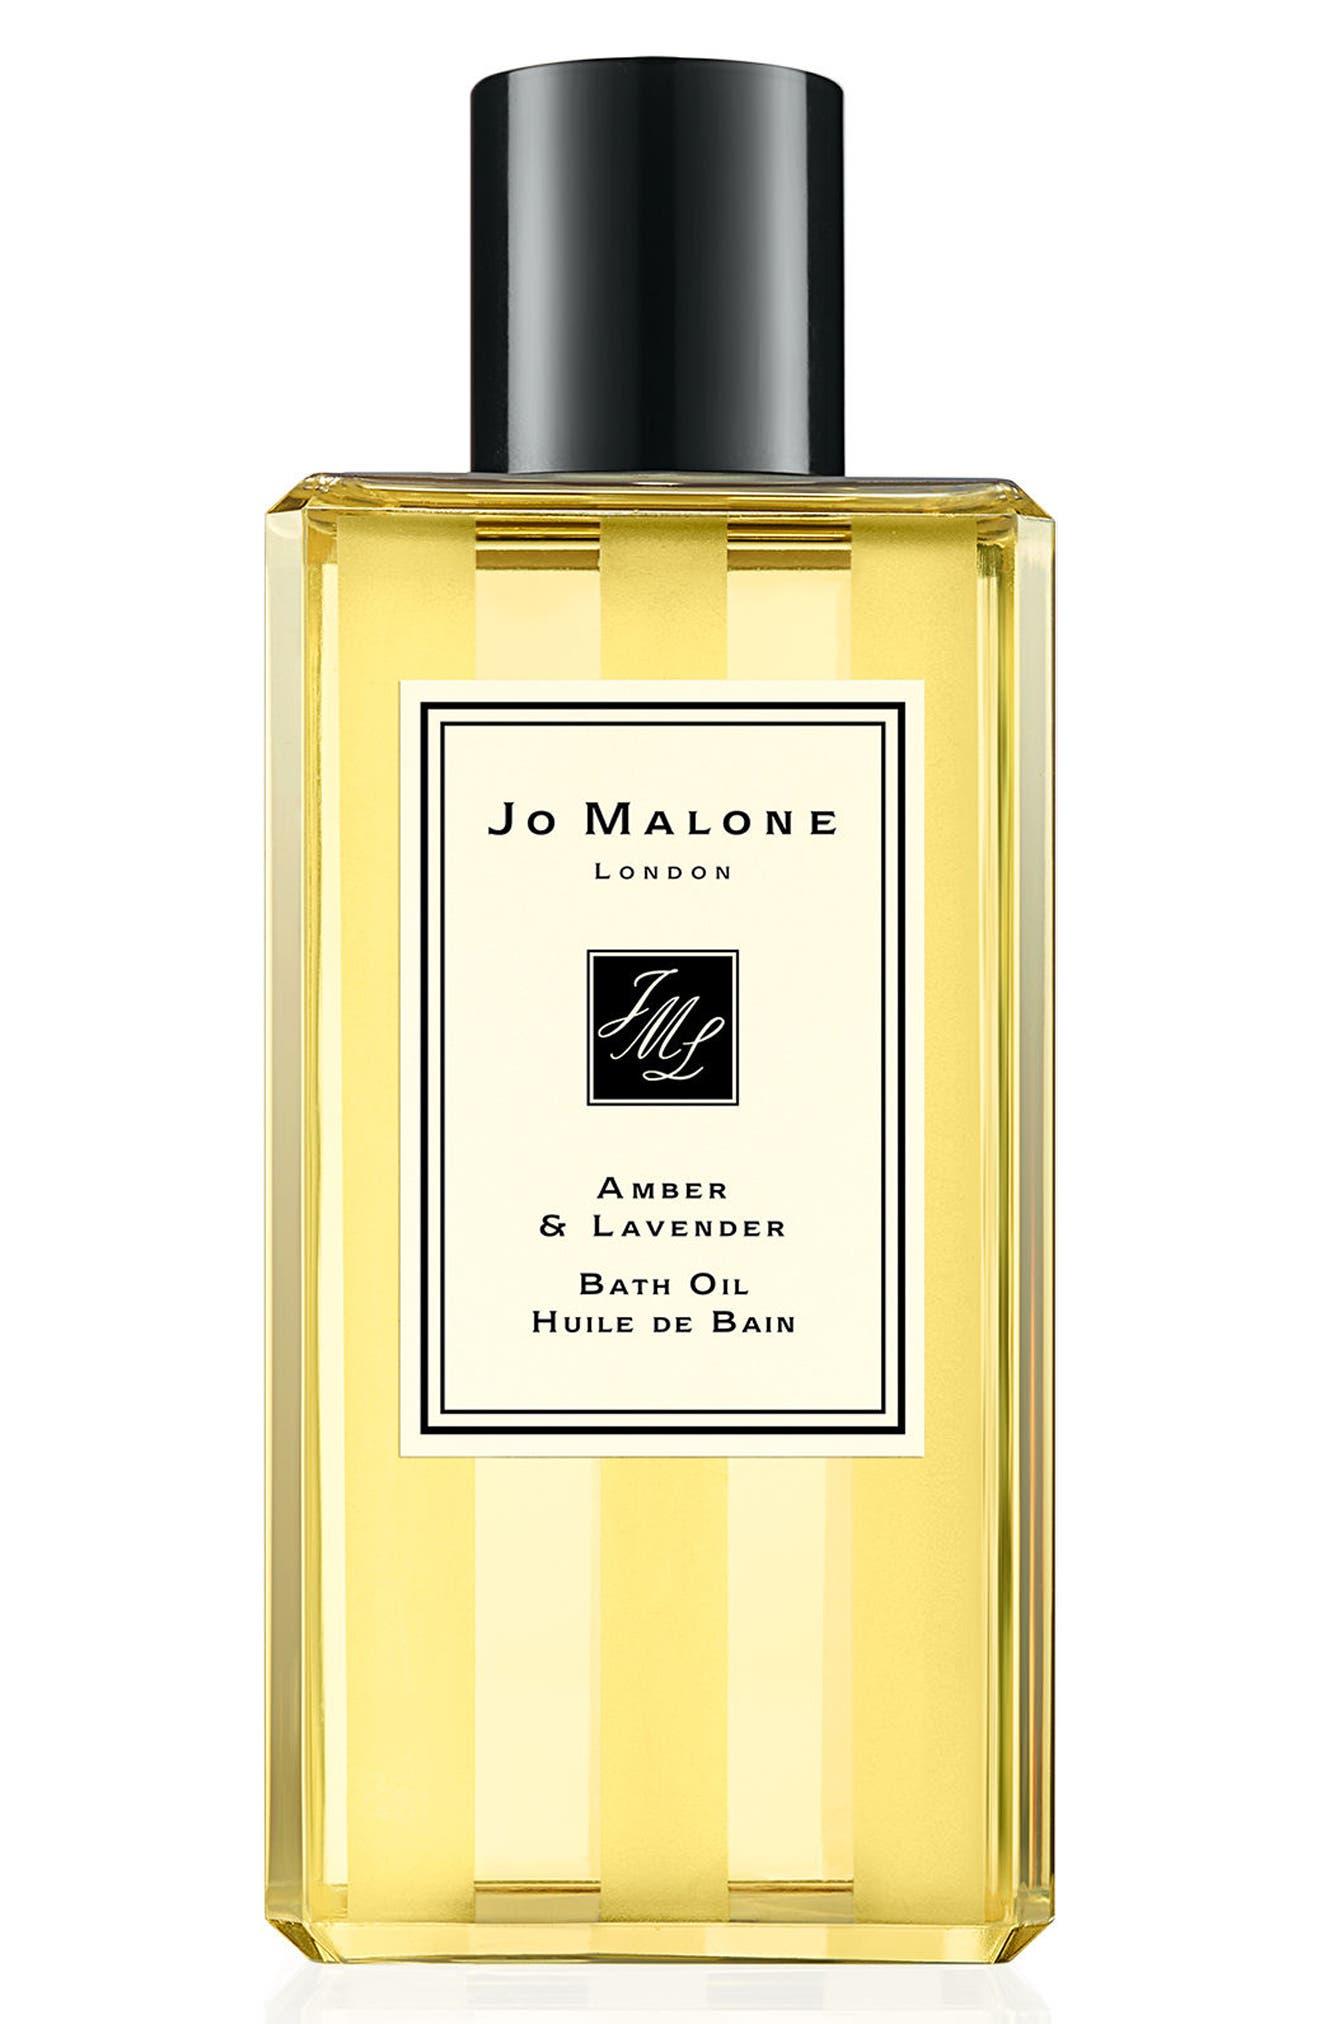 Jo Malone London™ 'Amber & Lavender' Bath Oil (8.5 oz.)